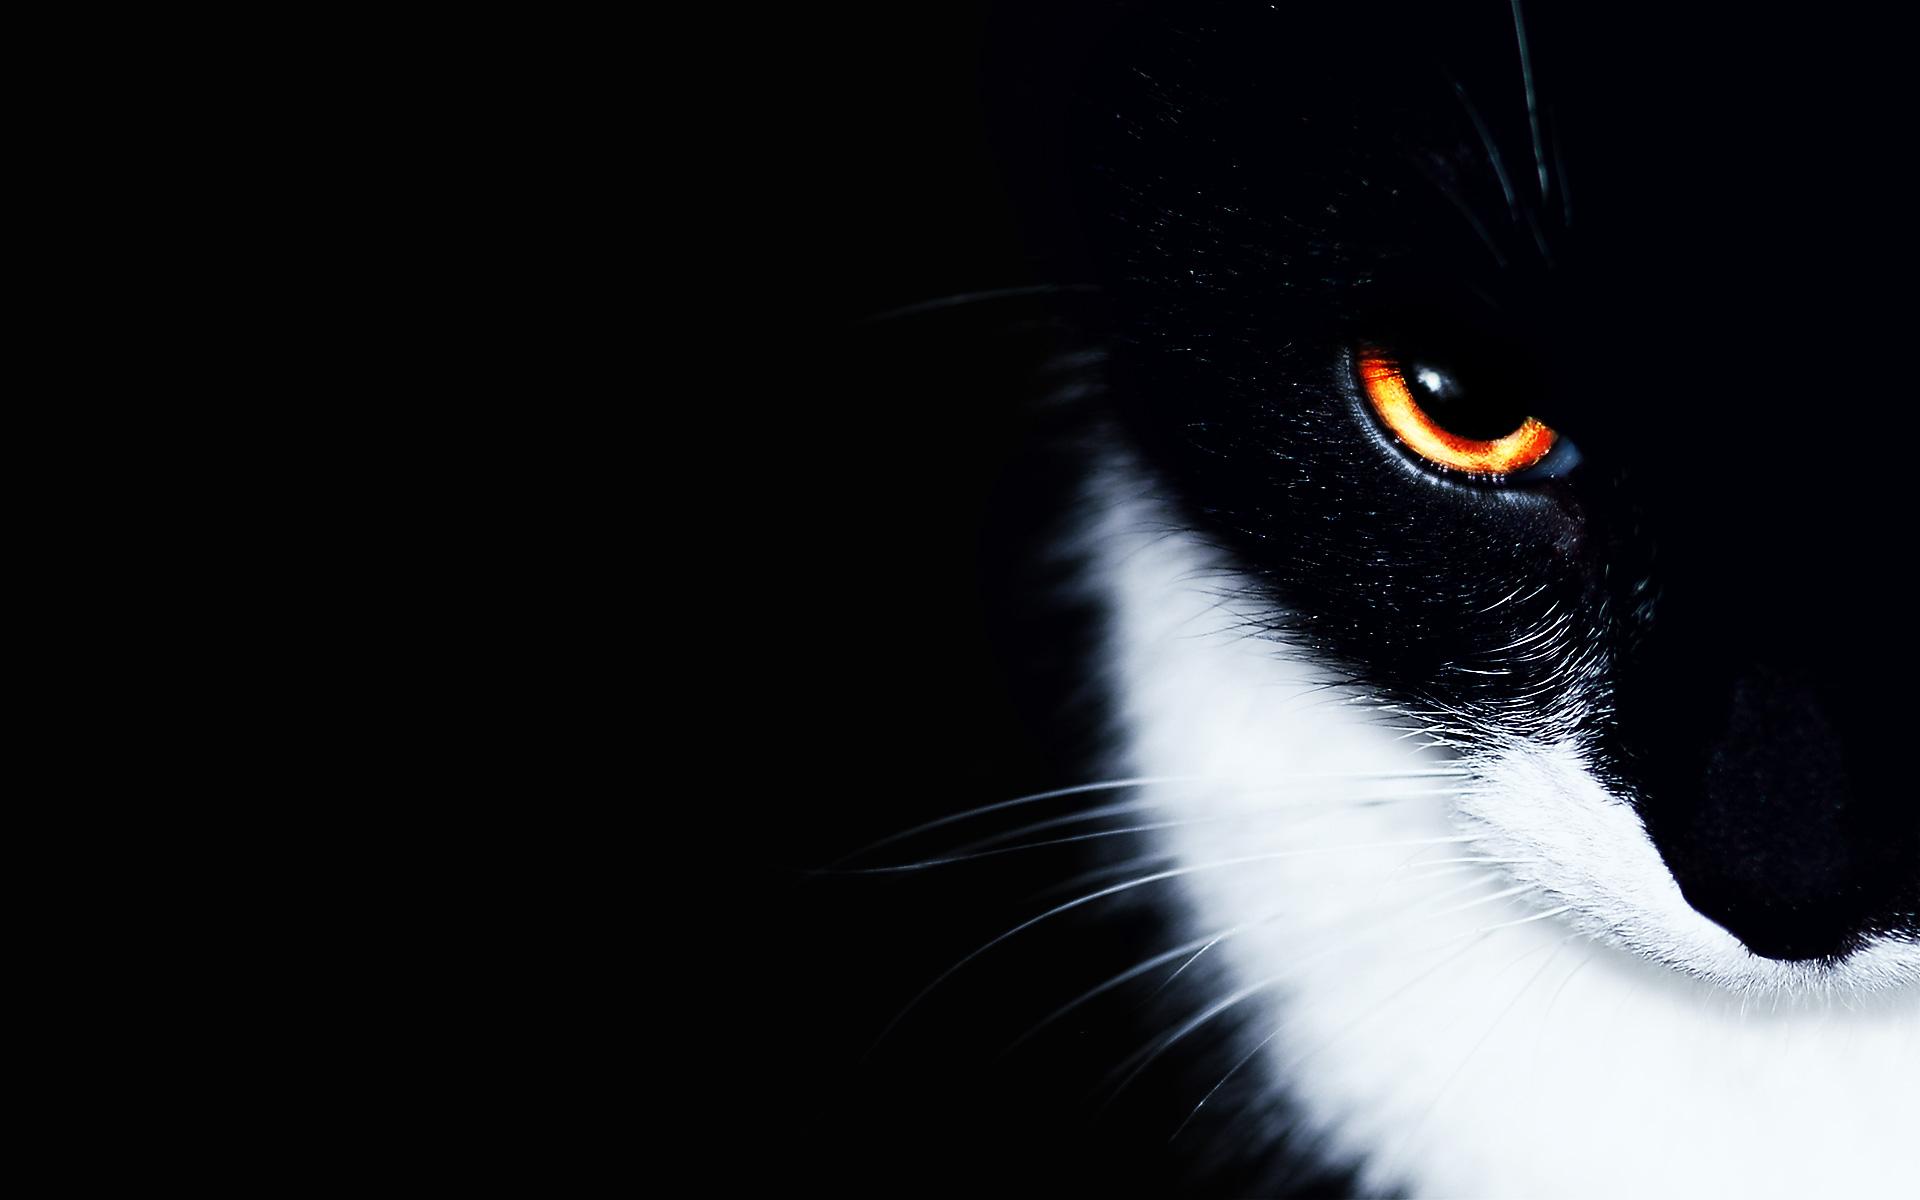 Cats_animals_orange_eyes_1920x1200.jpg